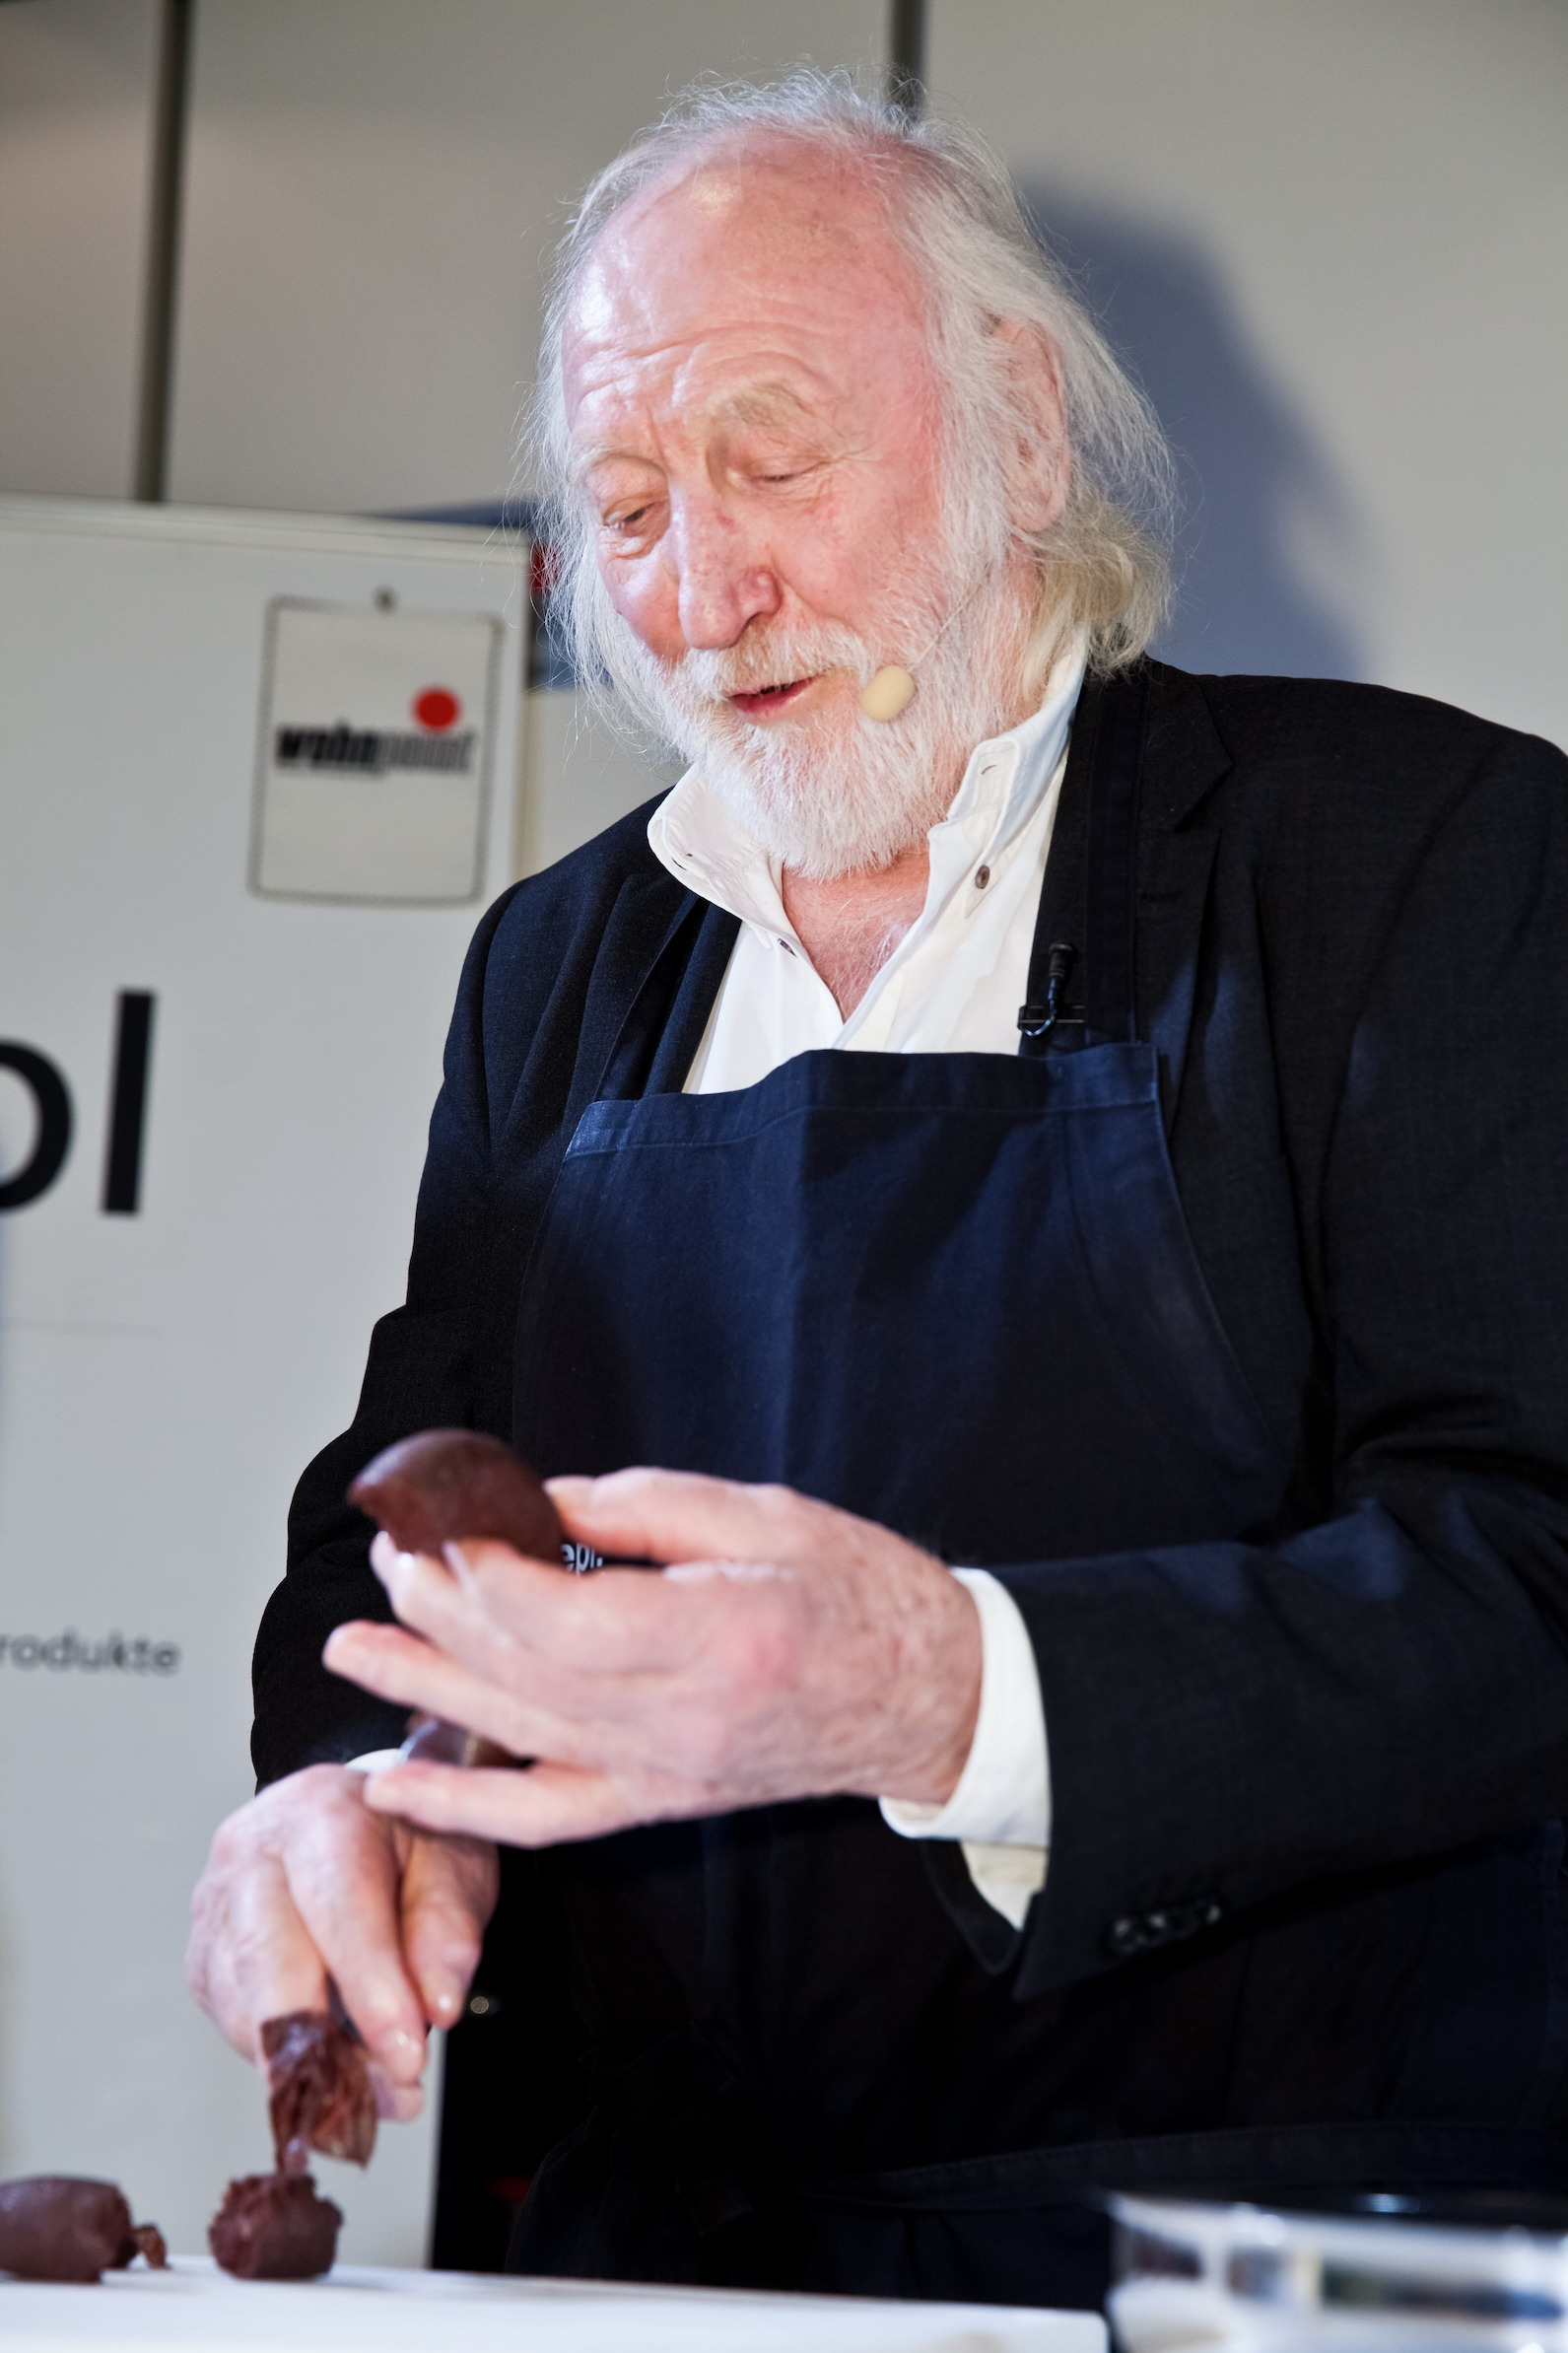 Karl Merkatz kocht bei Wohnpoint